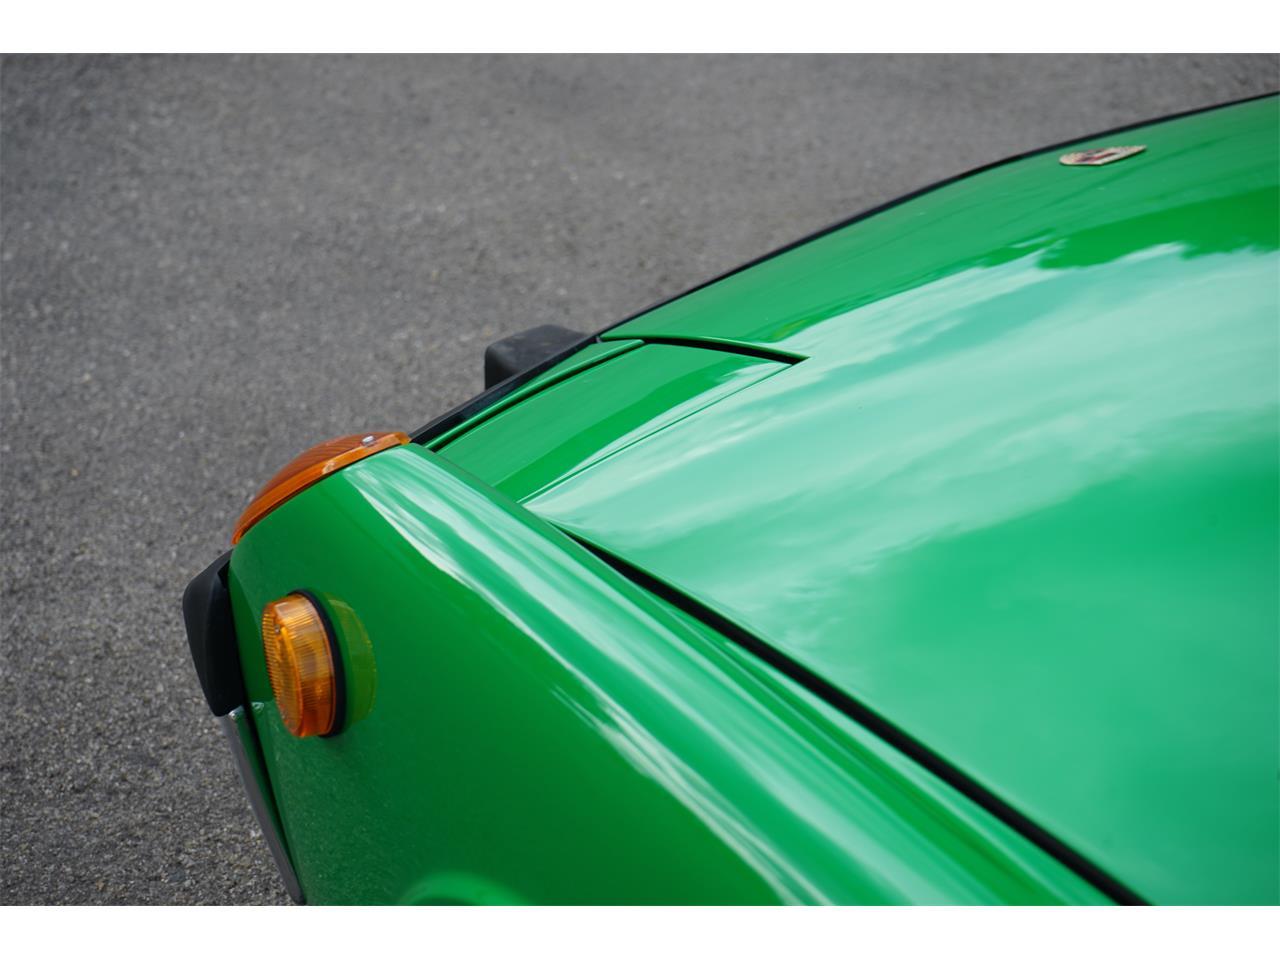 1973 Porsche 914 (CC-1413802) for sale in Boise, Idaho